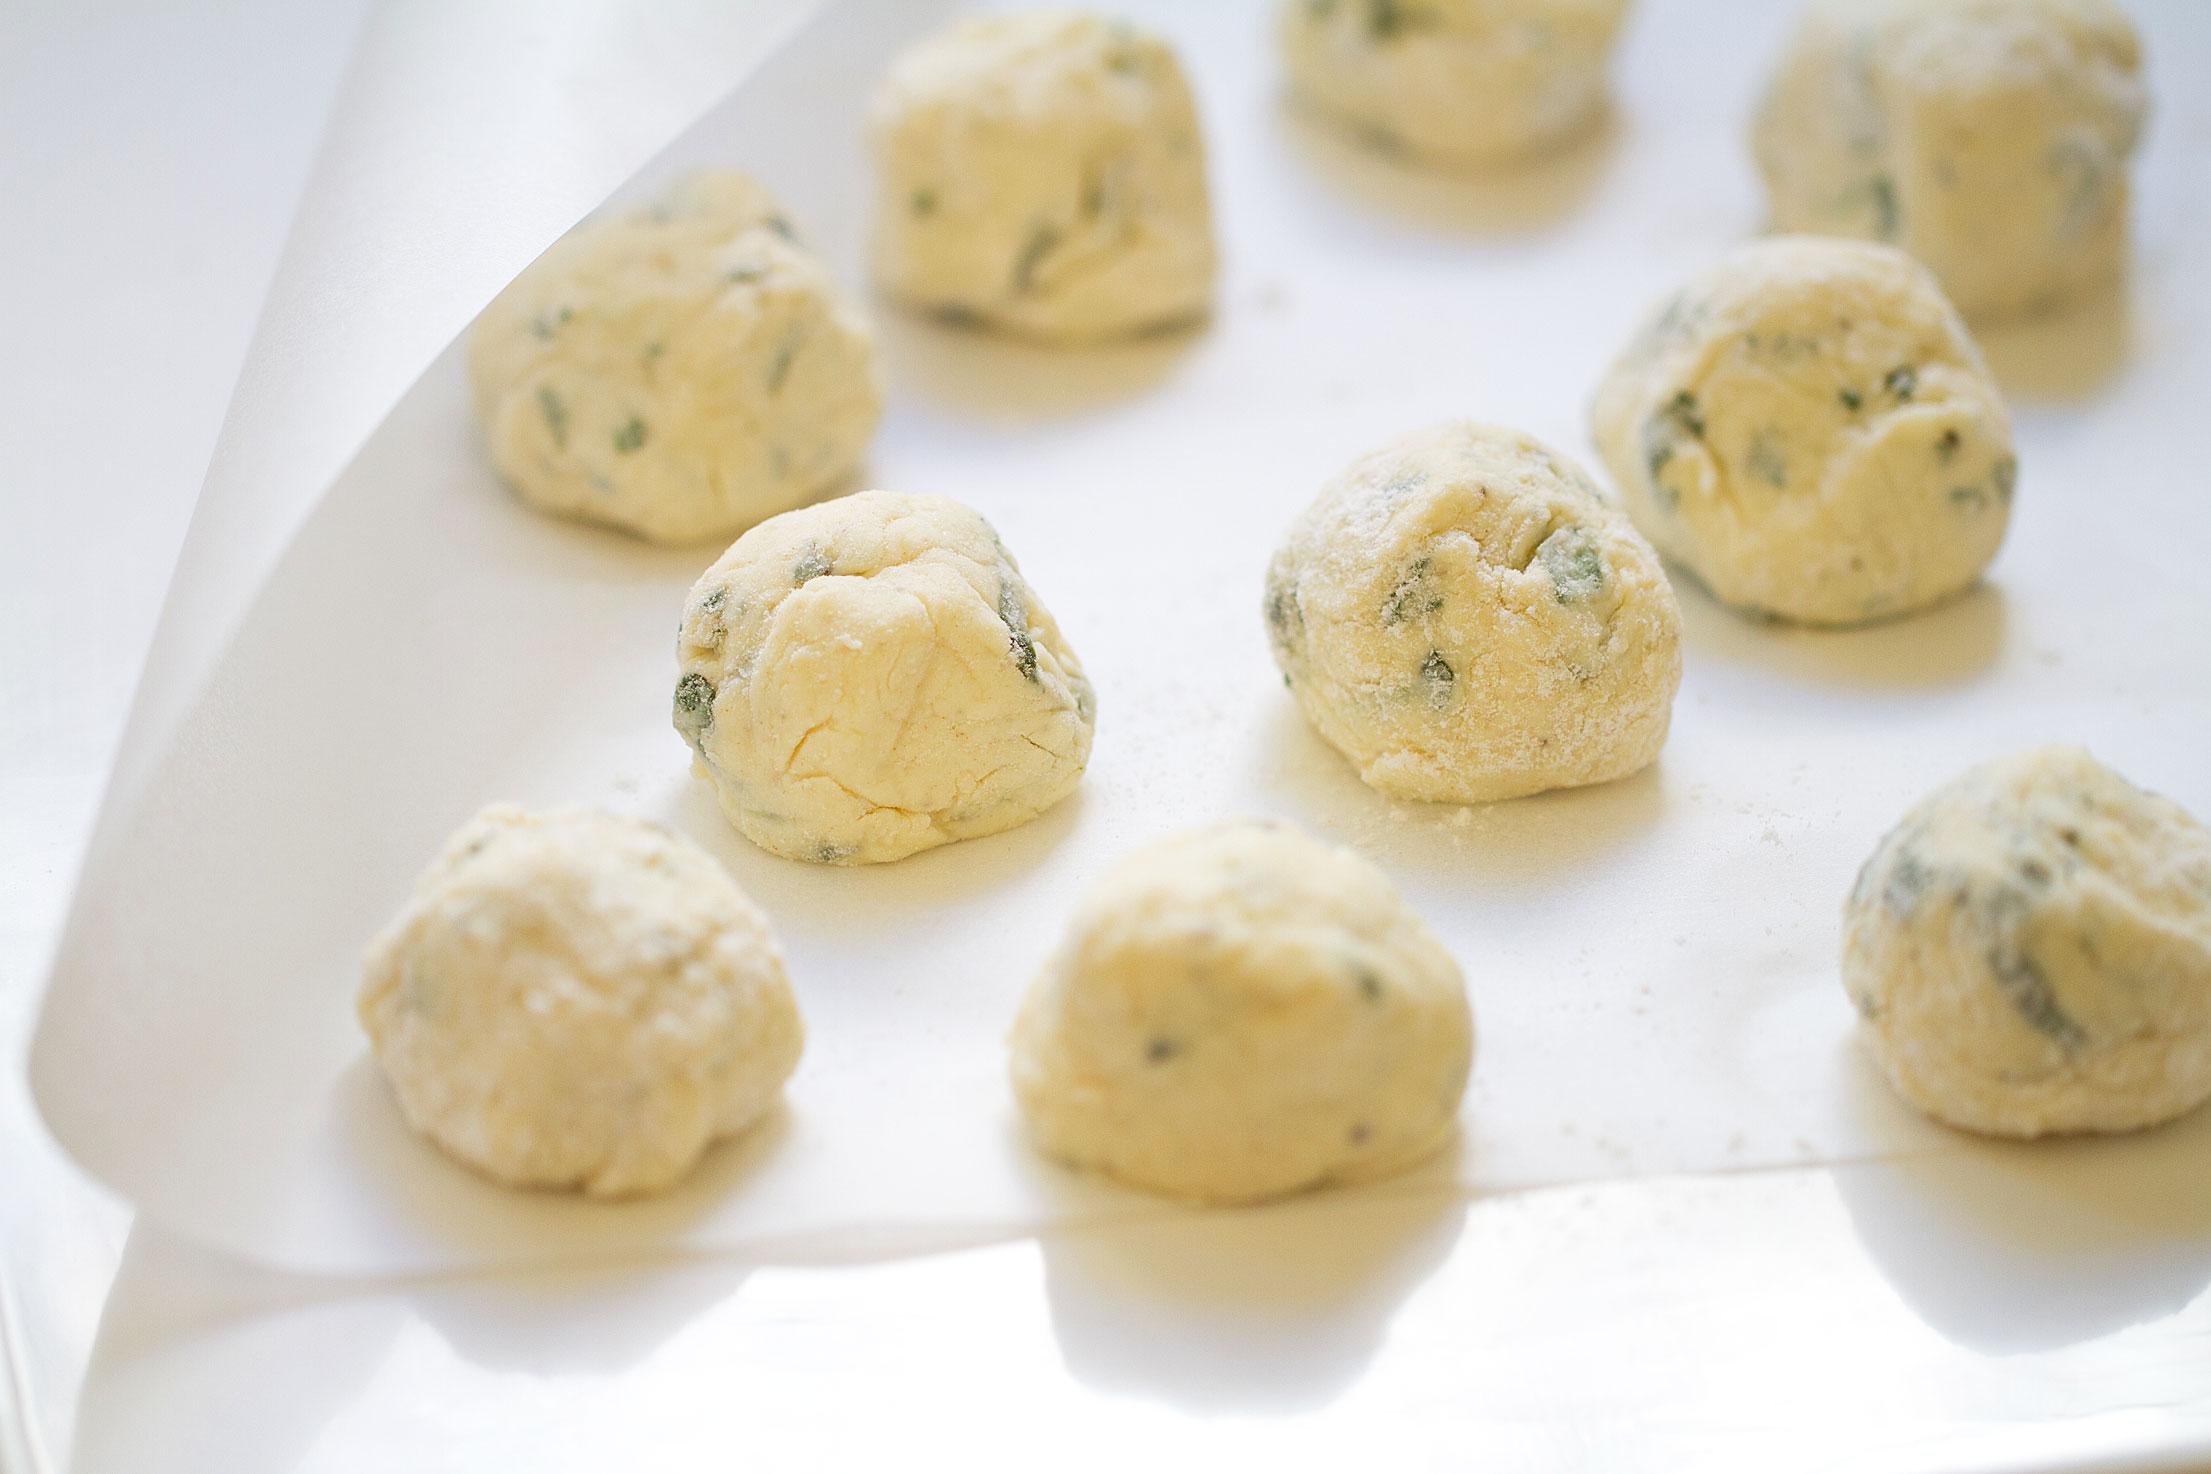 Ricotta Dumplings or Gnocchi?